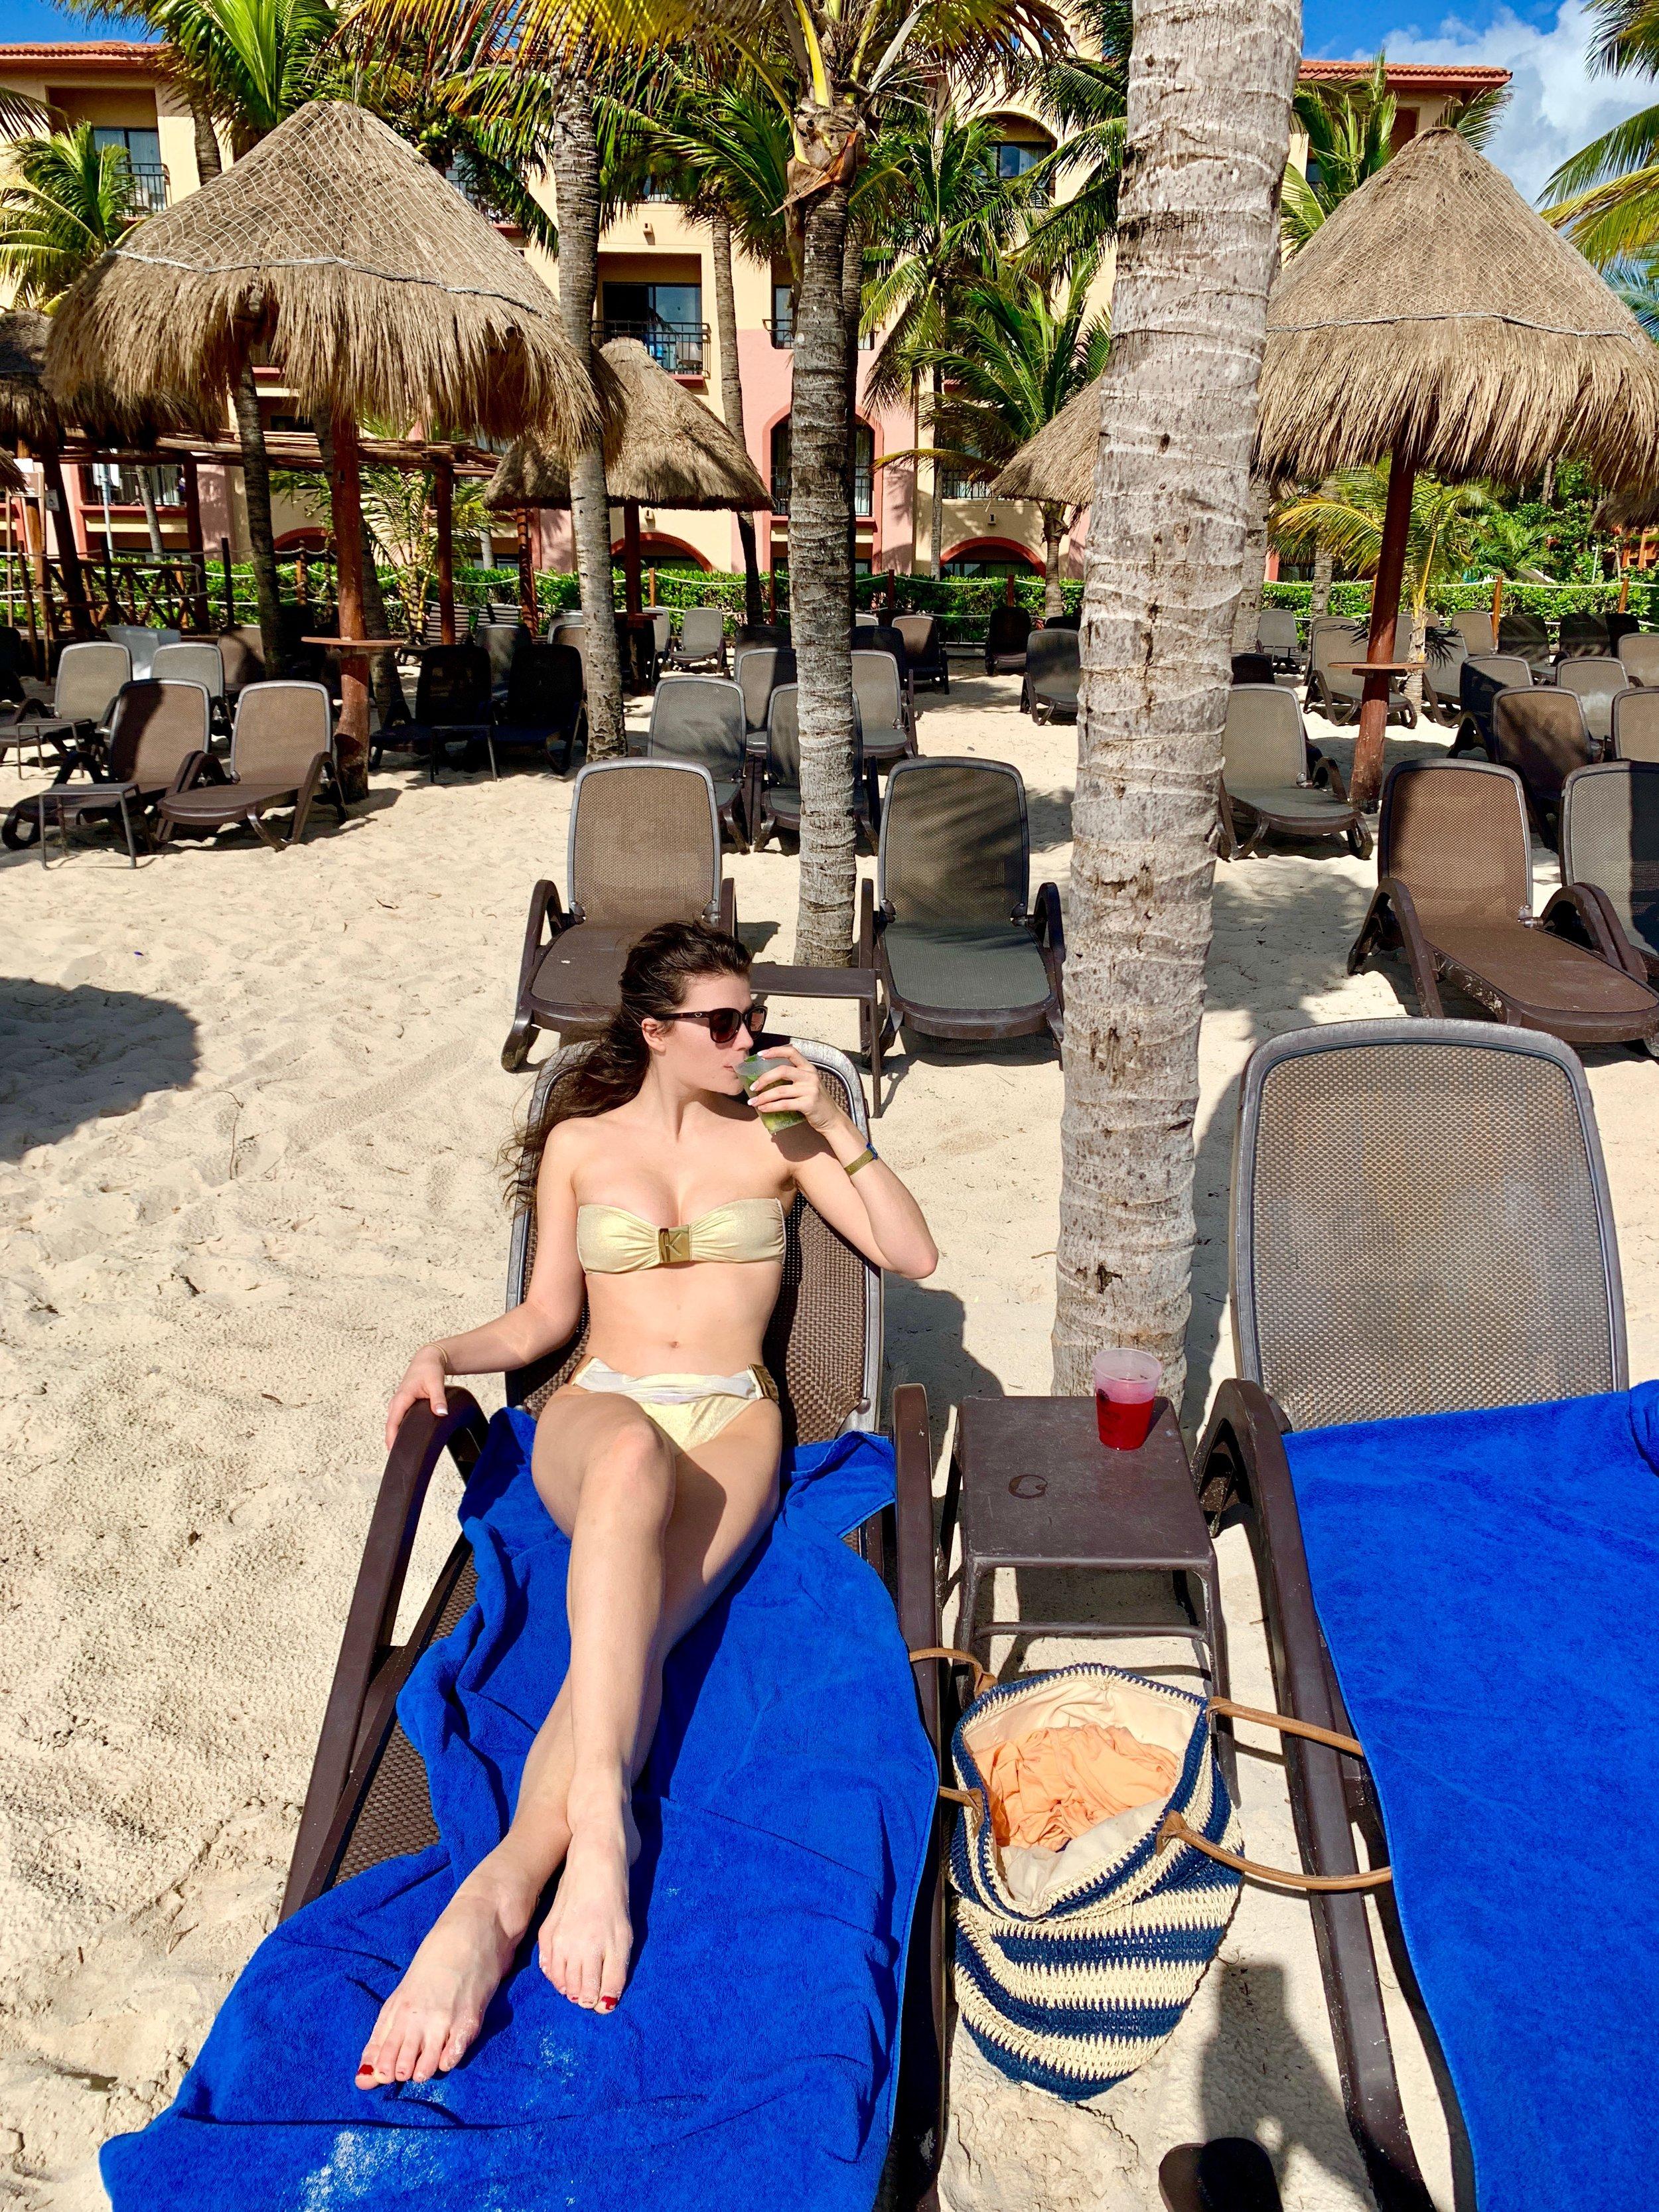 Sipping on a delicious mojito at the Sandos Playacar Resort!